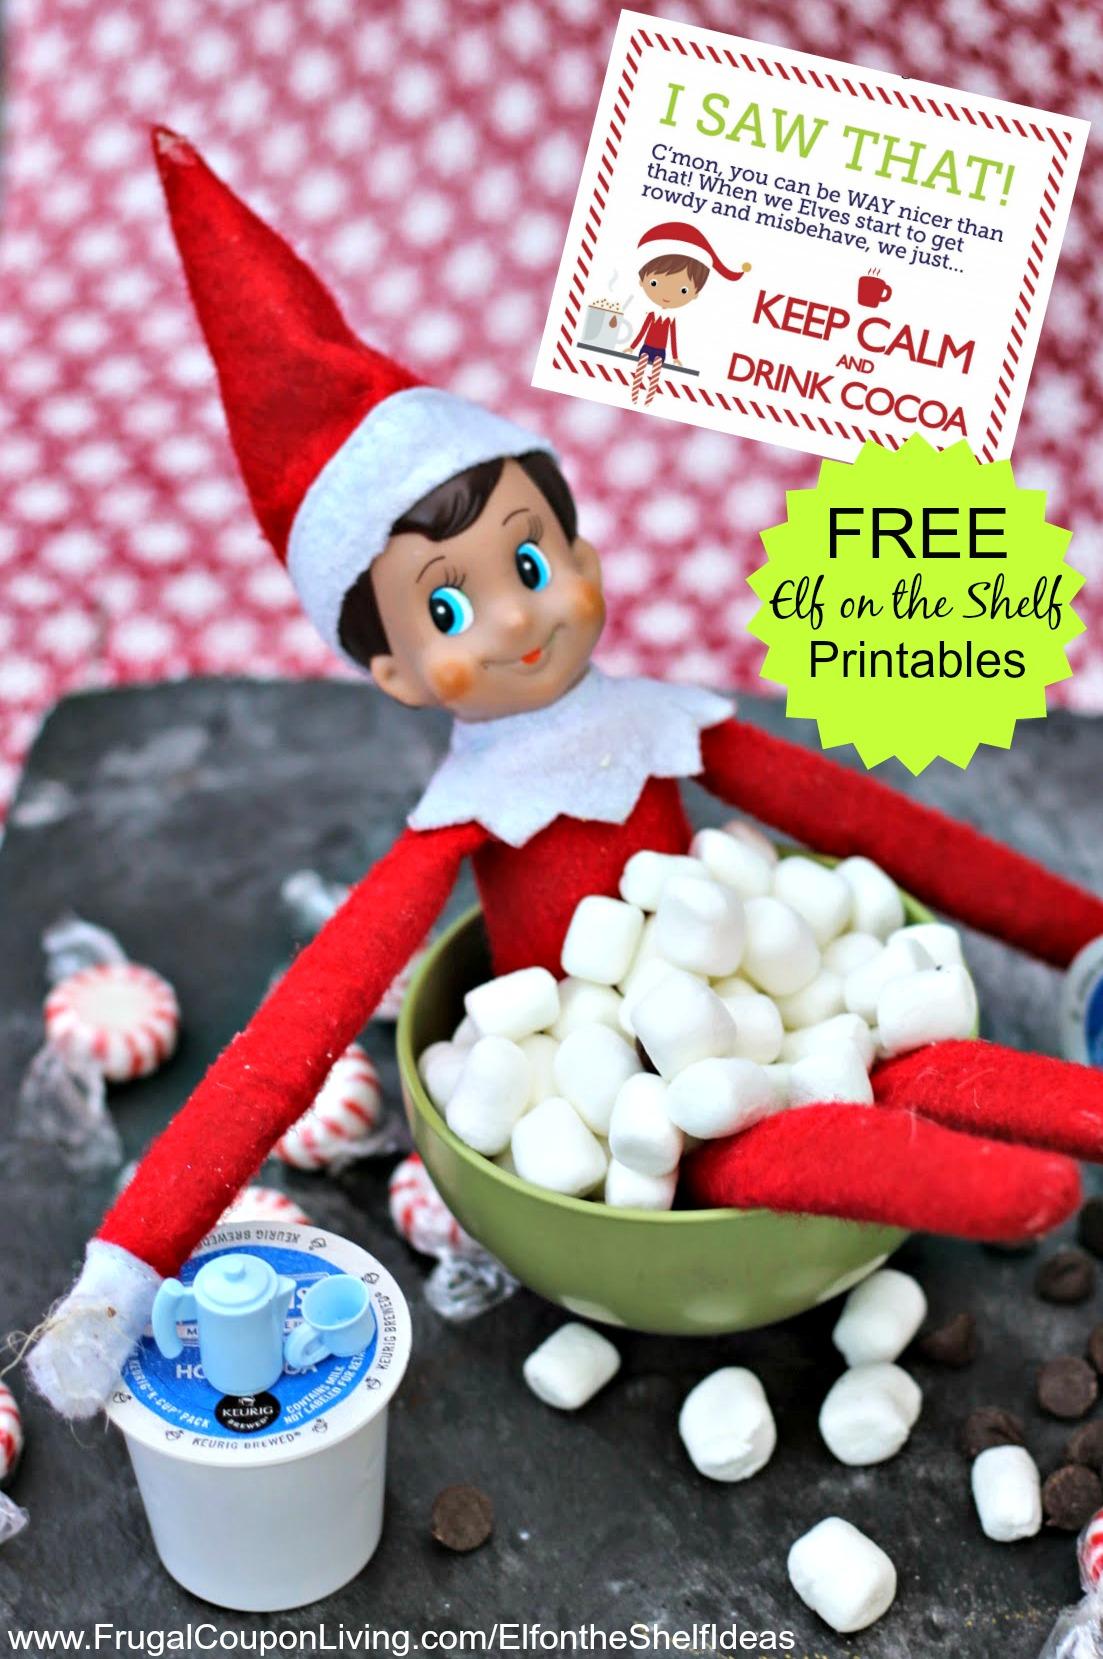 elf-on-the-shelf-ideas-cocoa-bubble-bath-frugal-coupon-living